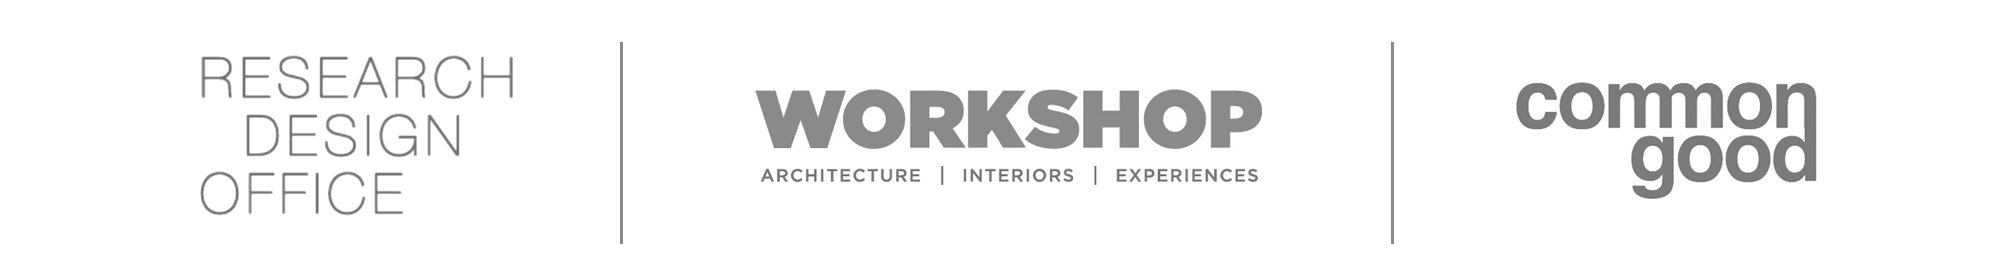 workshopgroup